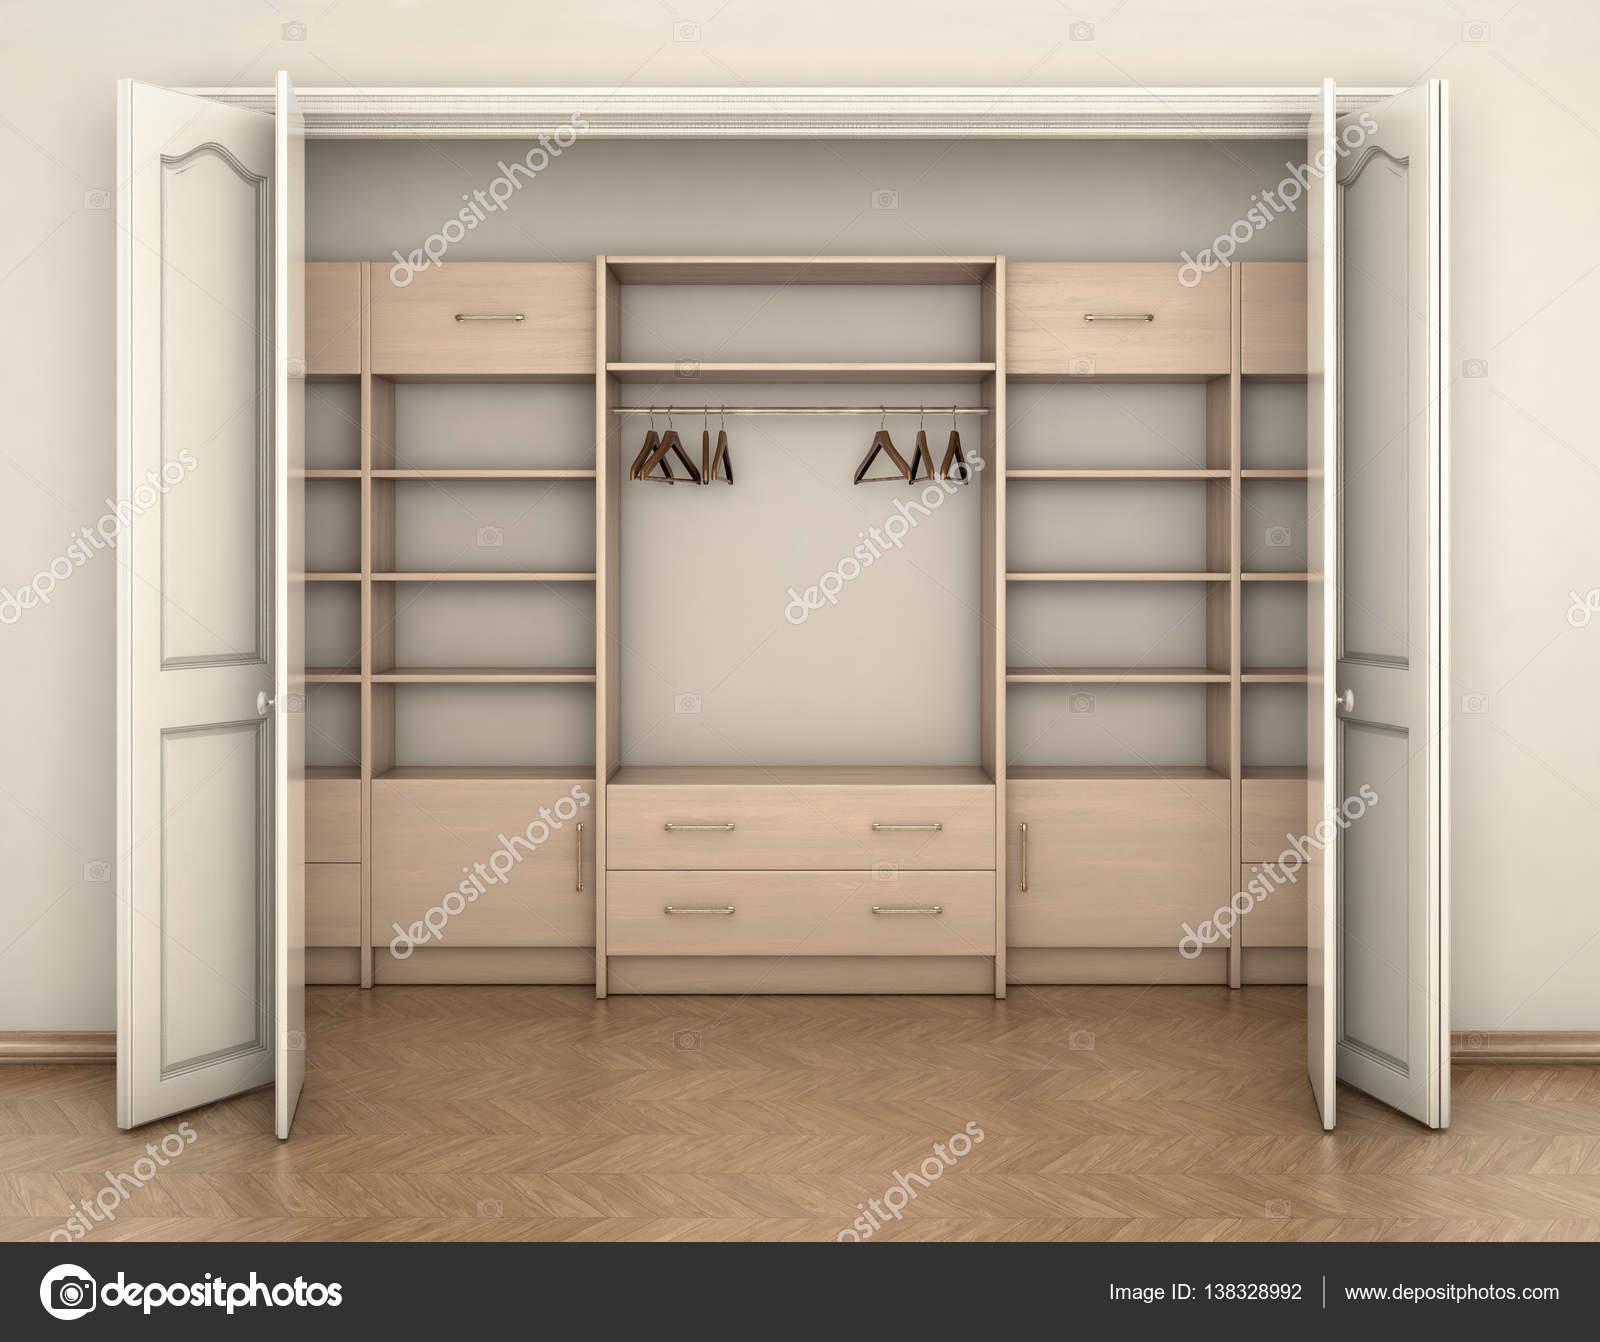 empty room interior and big white empty closet 3d illustration